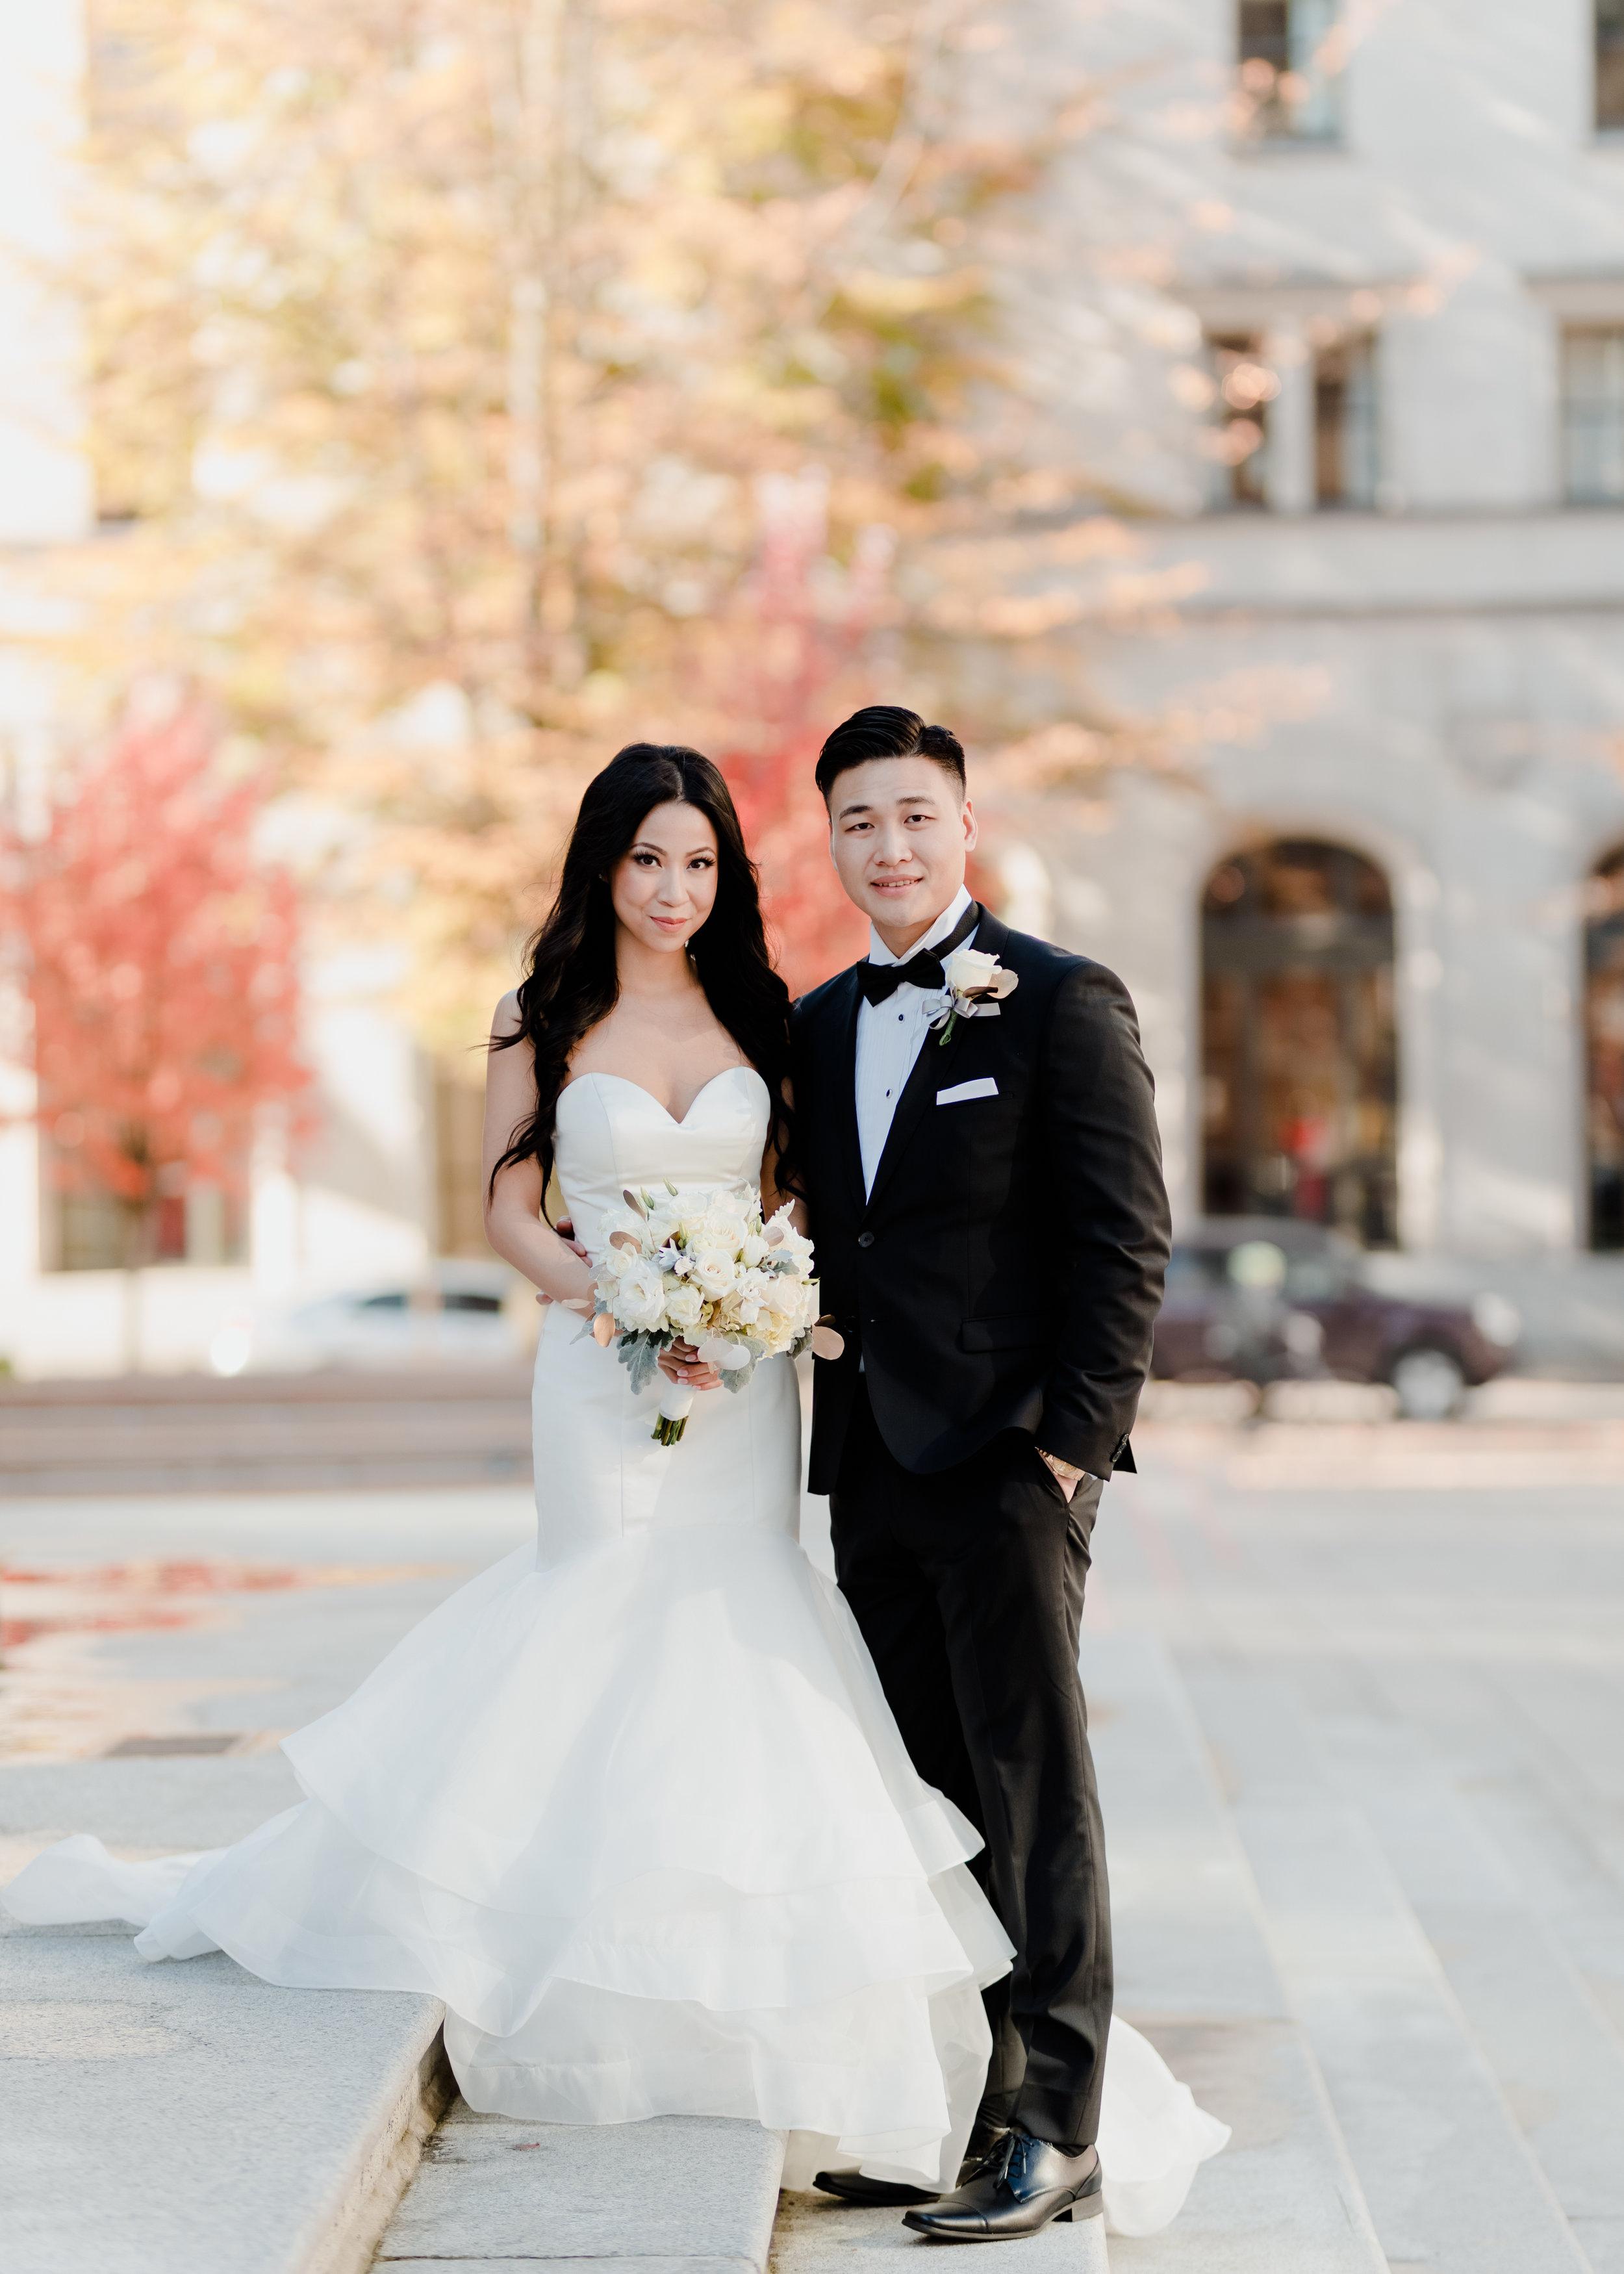 HeraStudios_Selects_Full_KatrinaAndrew_Wedding_Version2-240.jpg